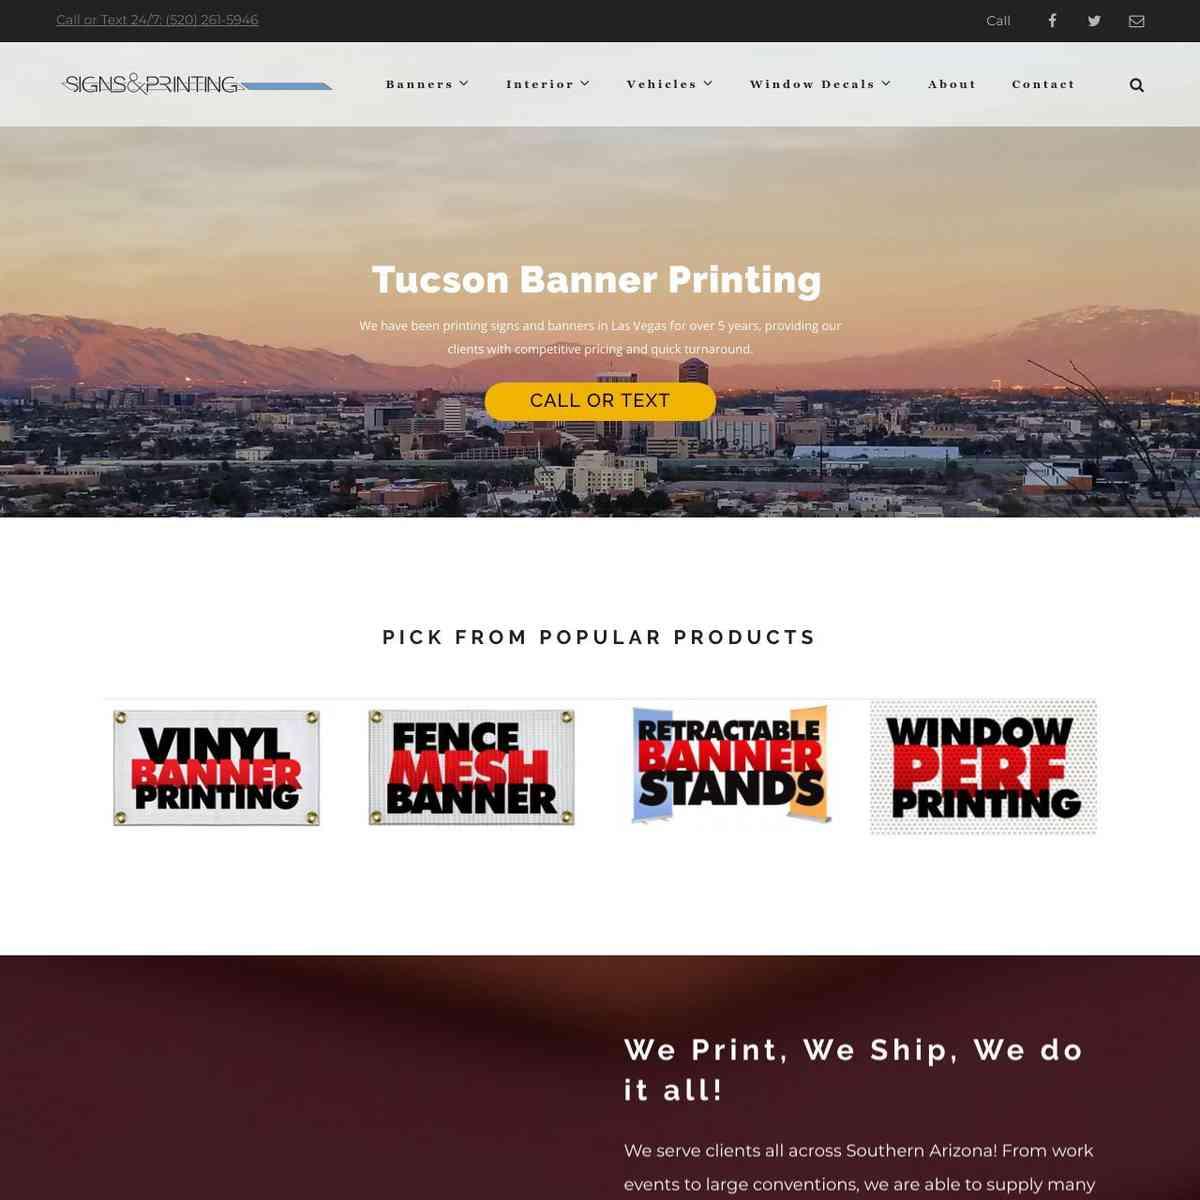 Tucson Banner Printing